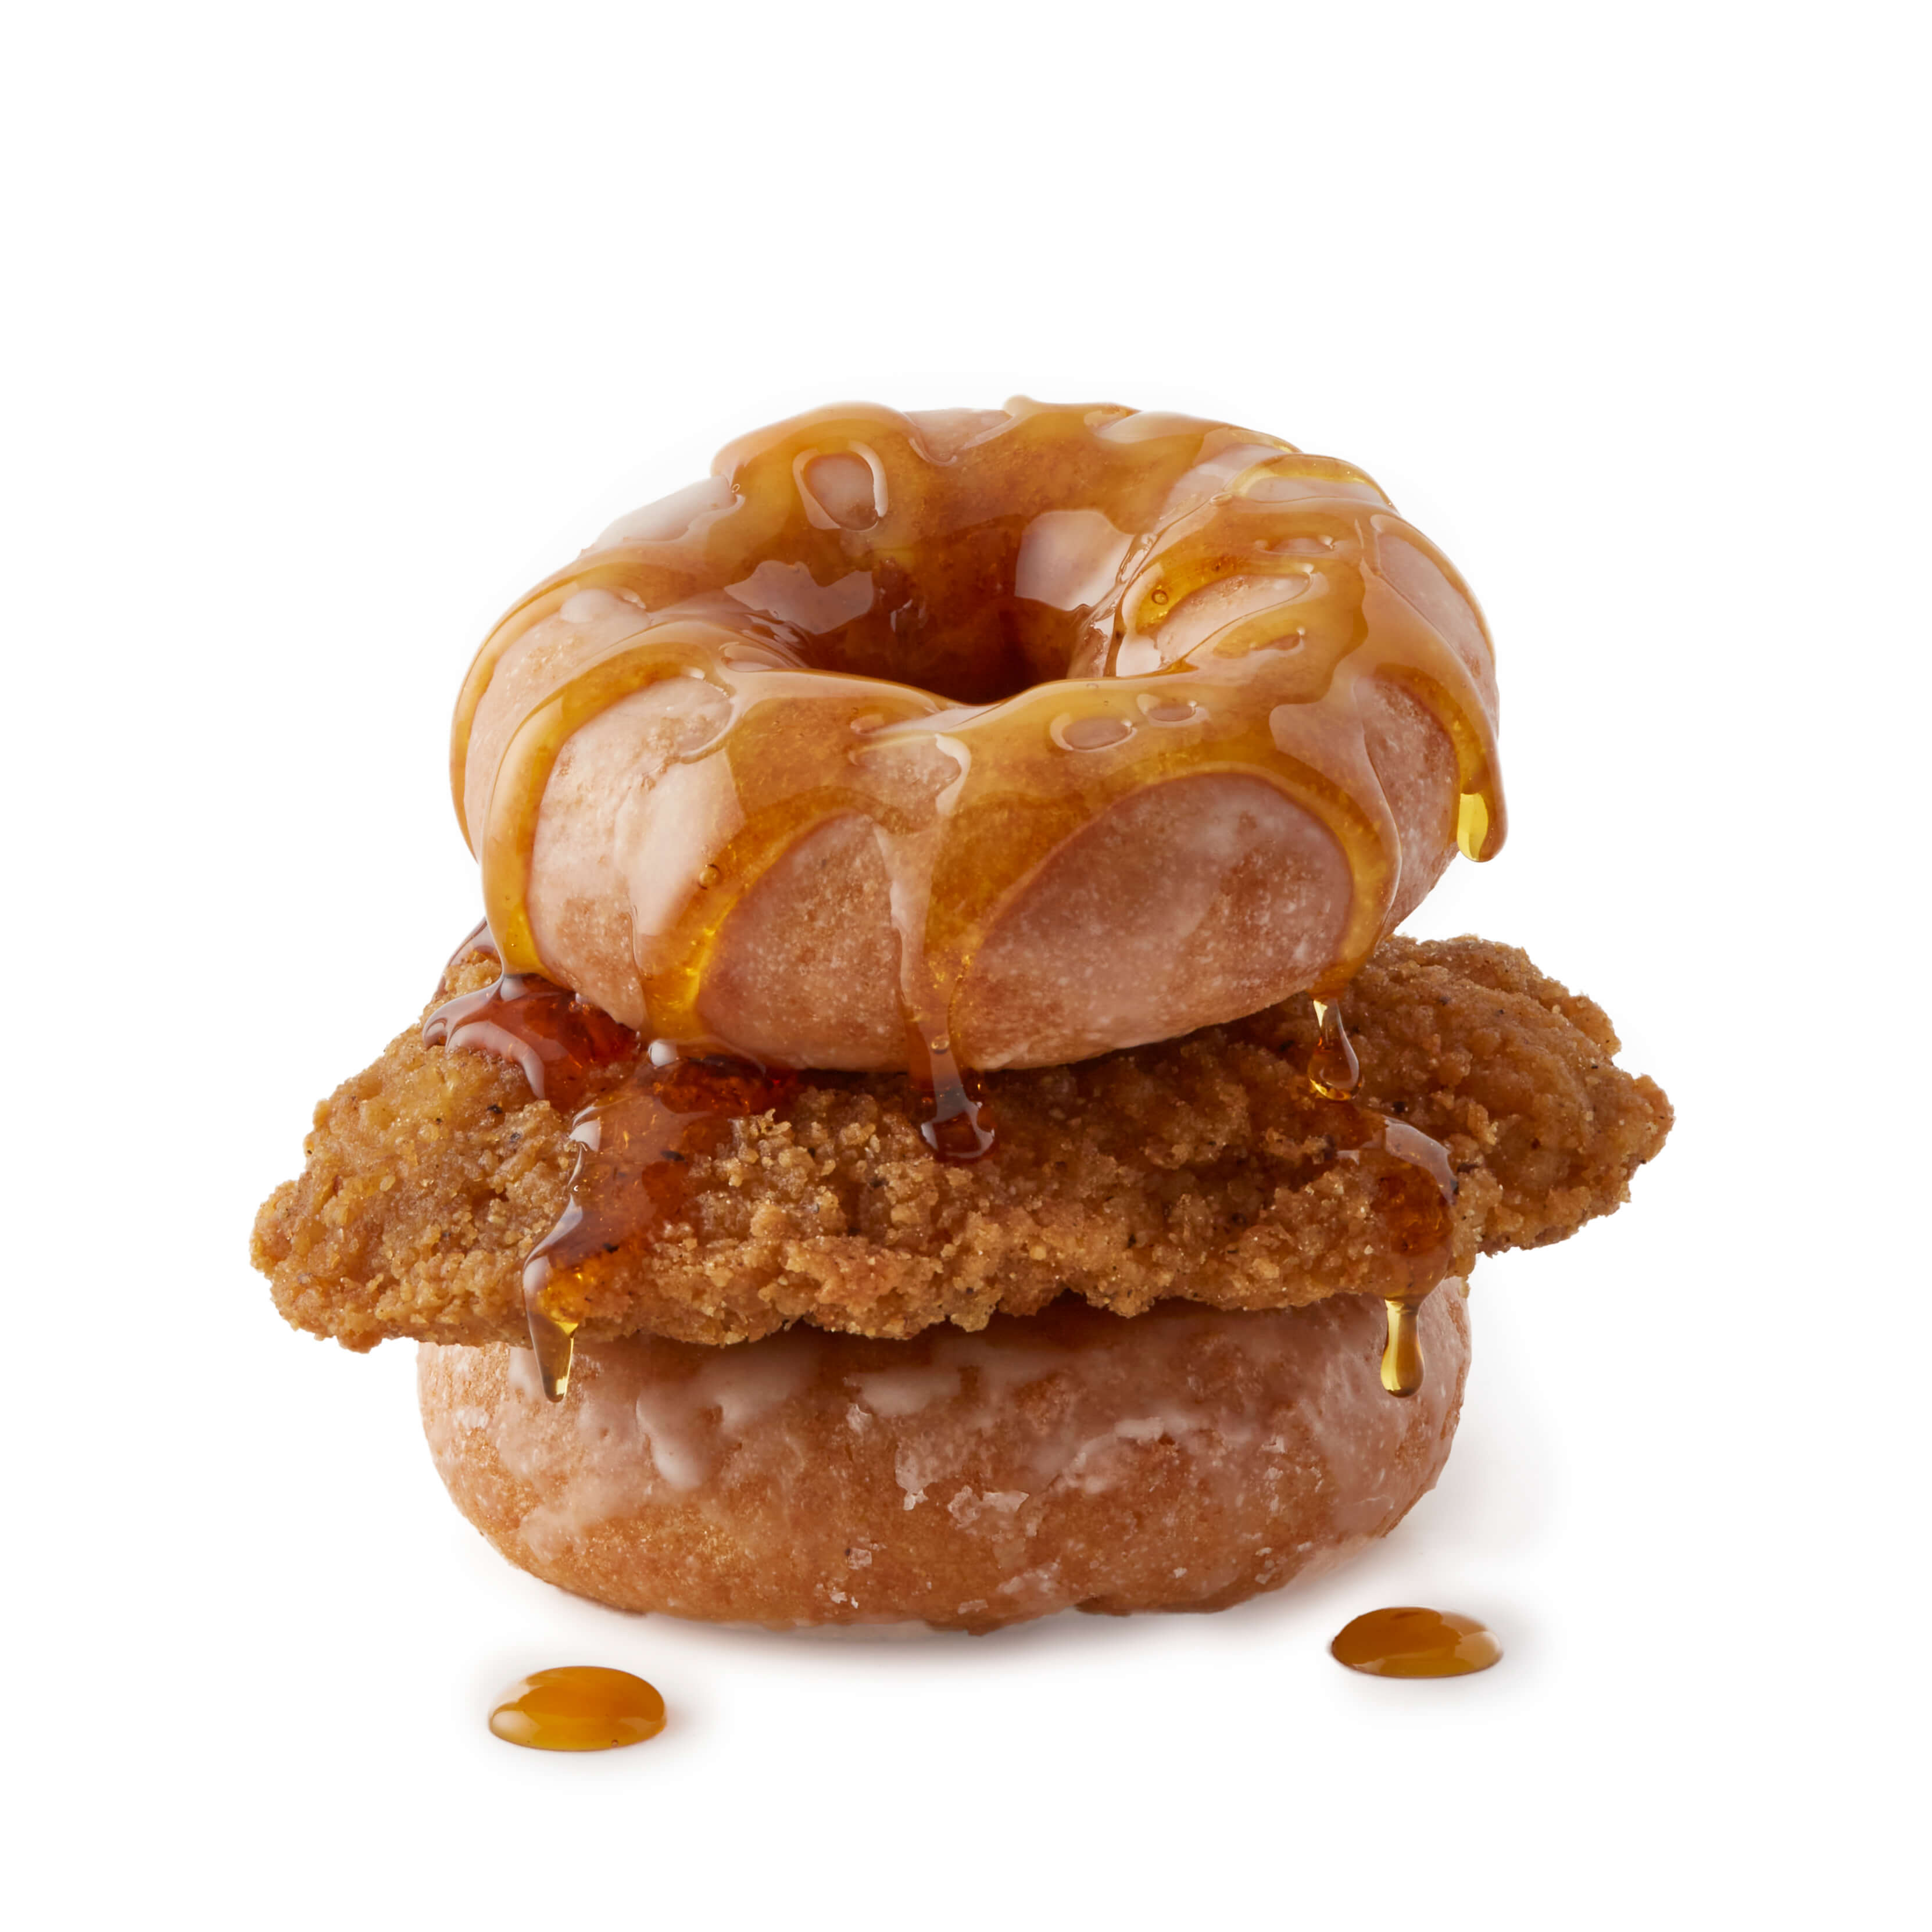 OFG - Old Fashioned Glazed Donut Sandwich